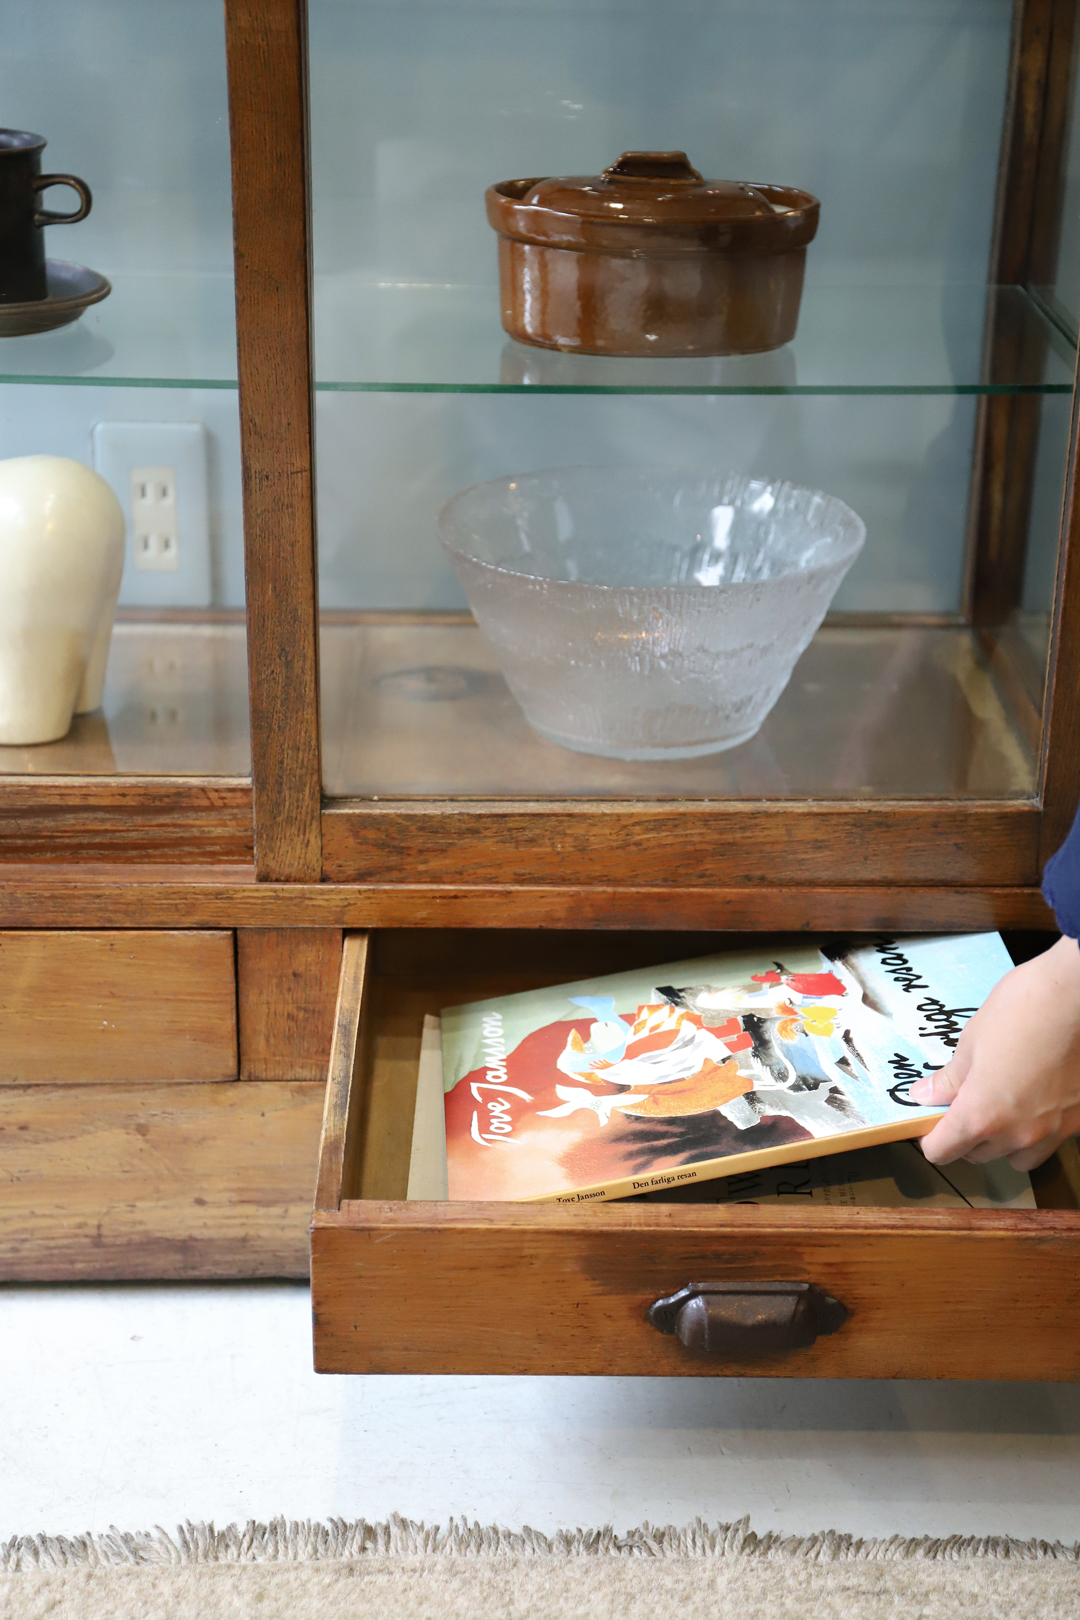 Japanese Vintage Glass Show Case/ジャパン ヴィンテージ ガラスショーケース 古道具 昭和レトロ モダン